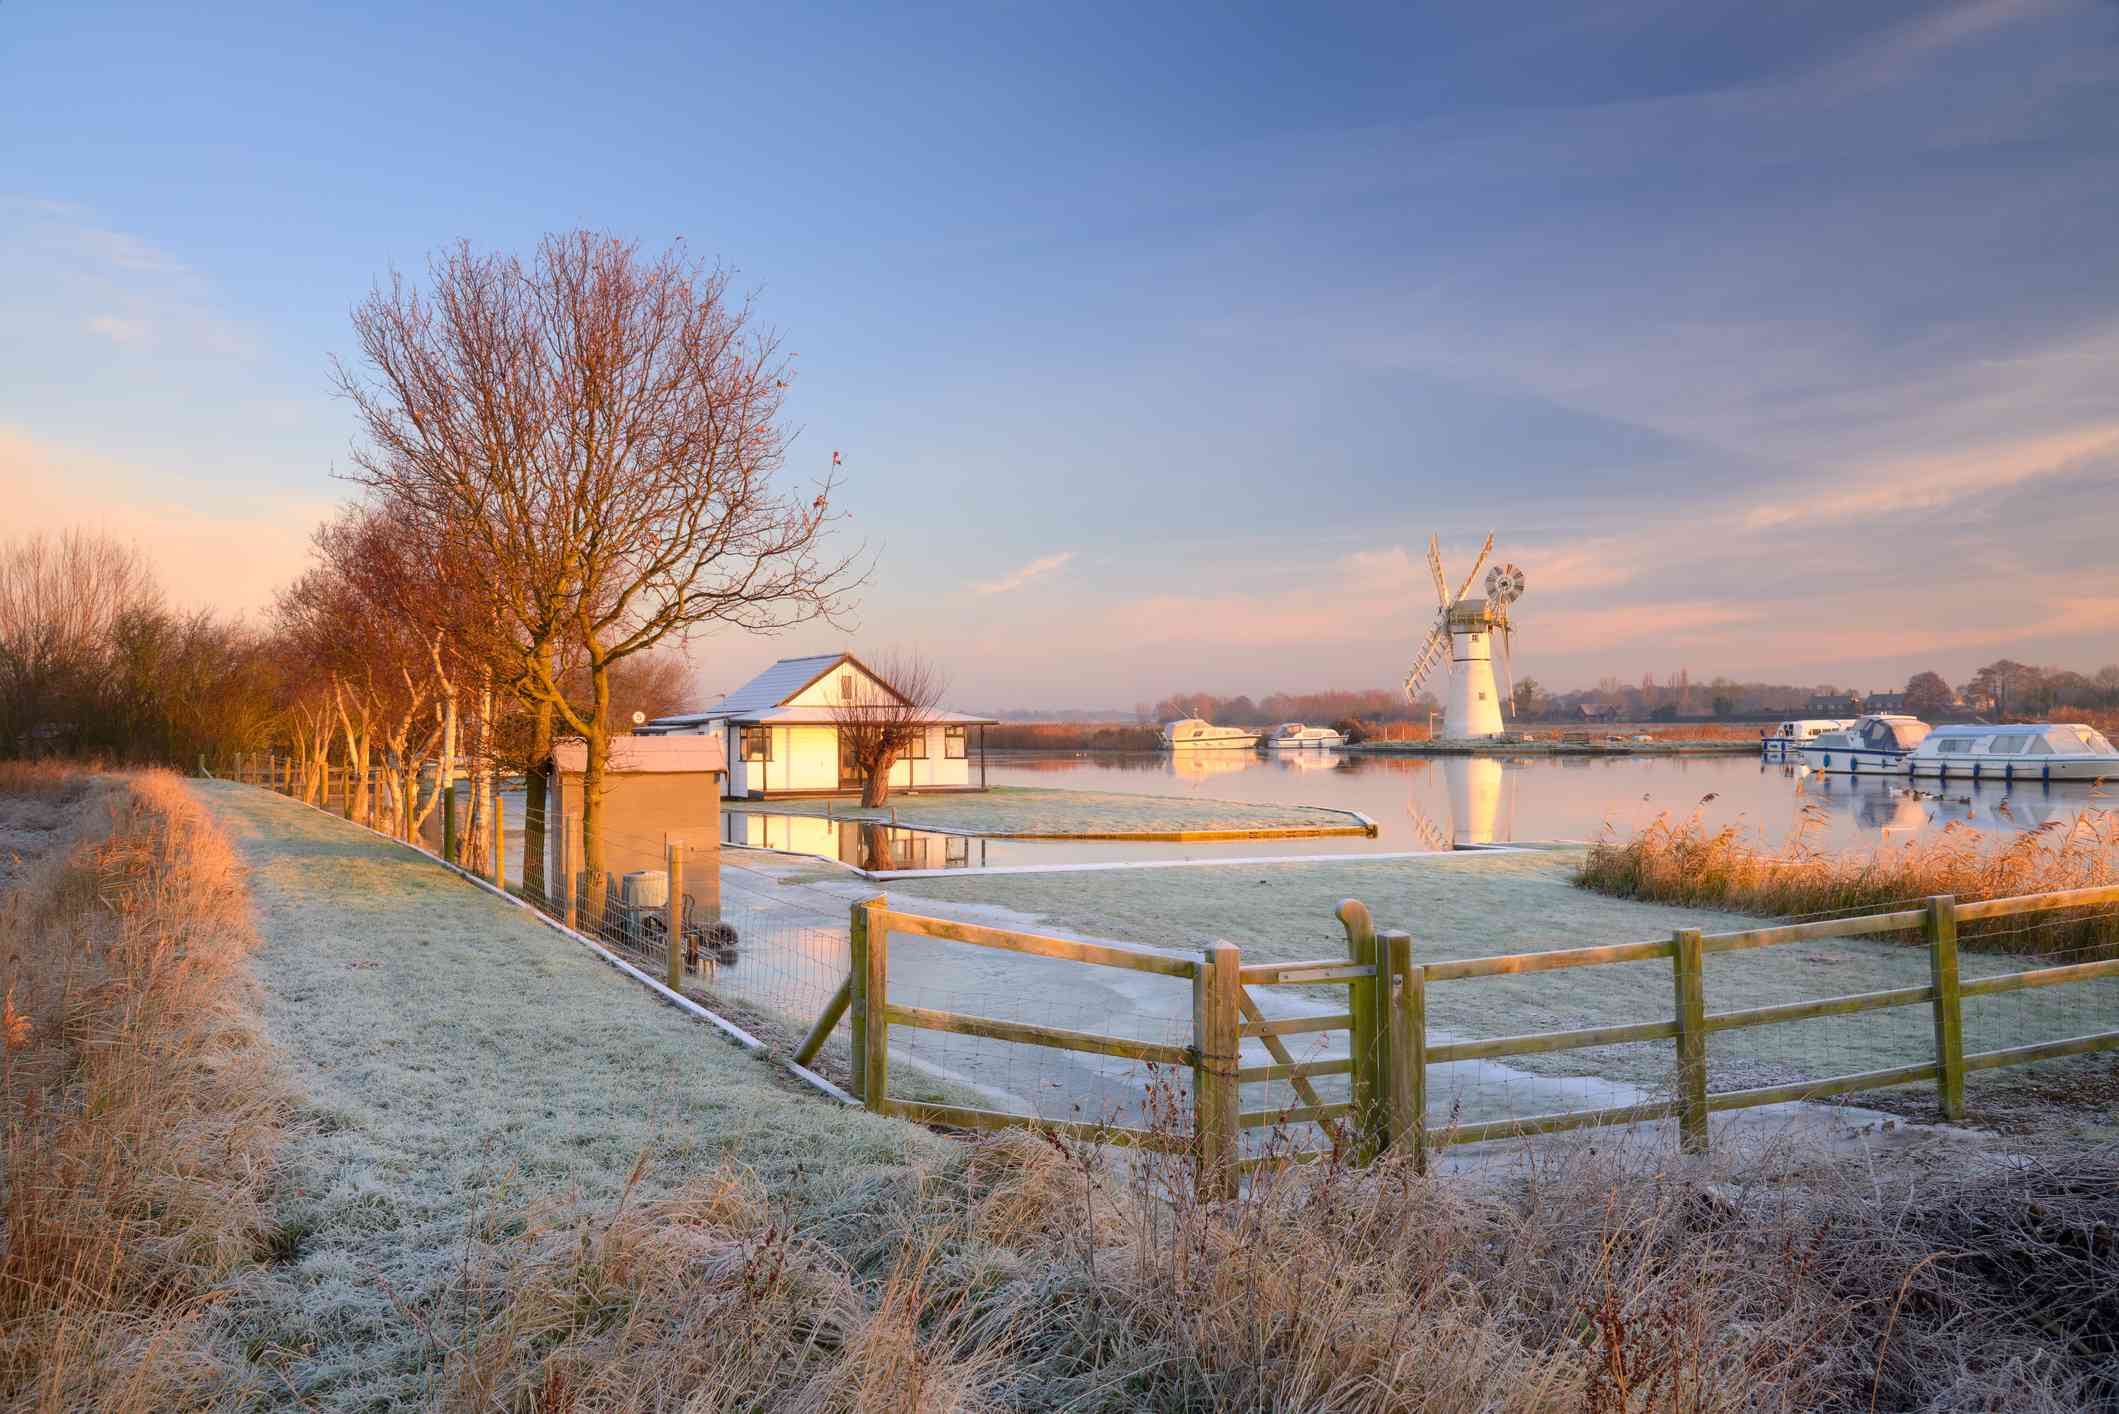 Winter Scene along the River Thurne on the Norfolk Broads National Park